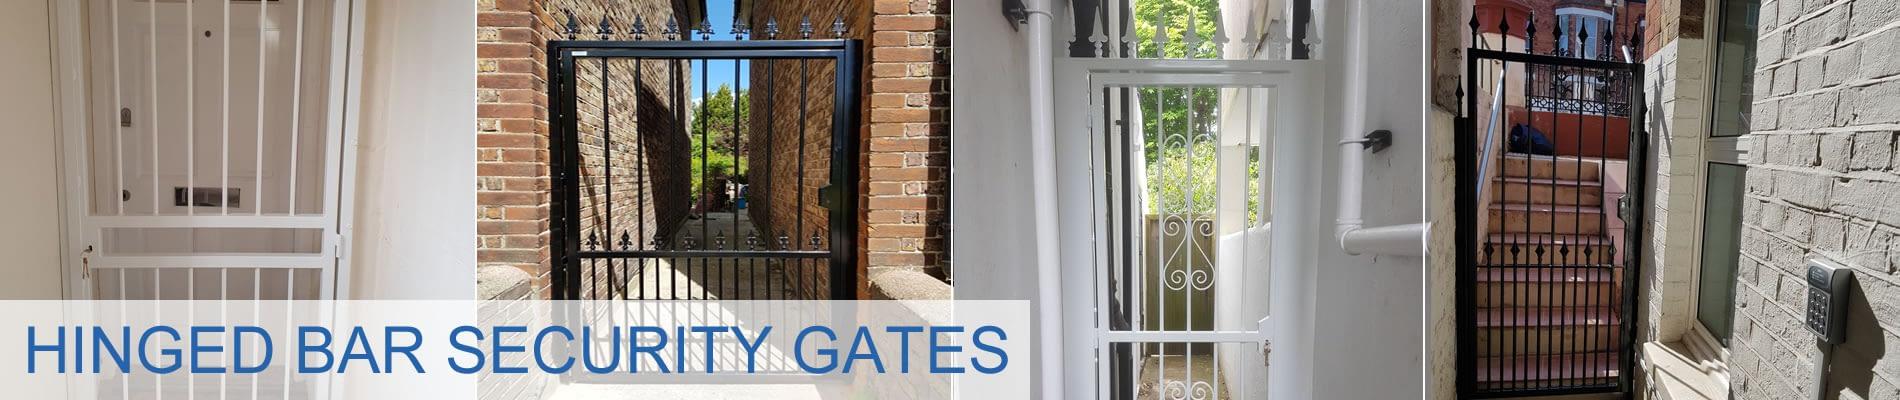 Security Grilles & Gates